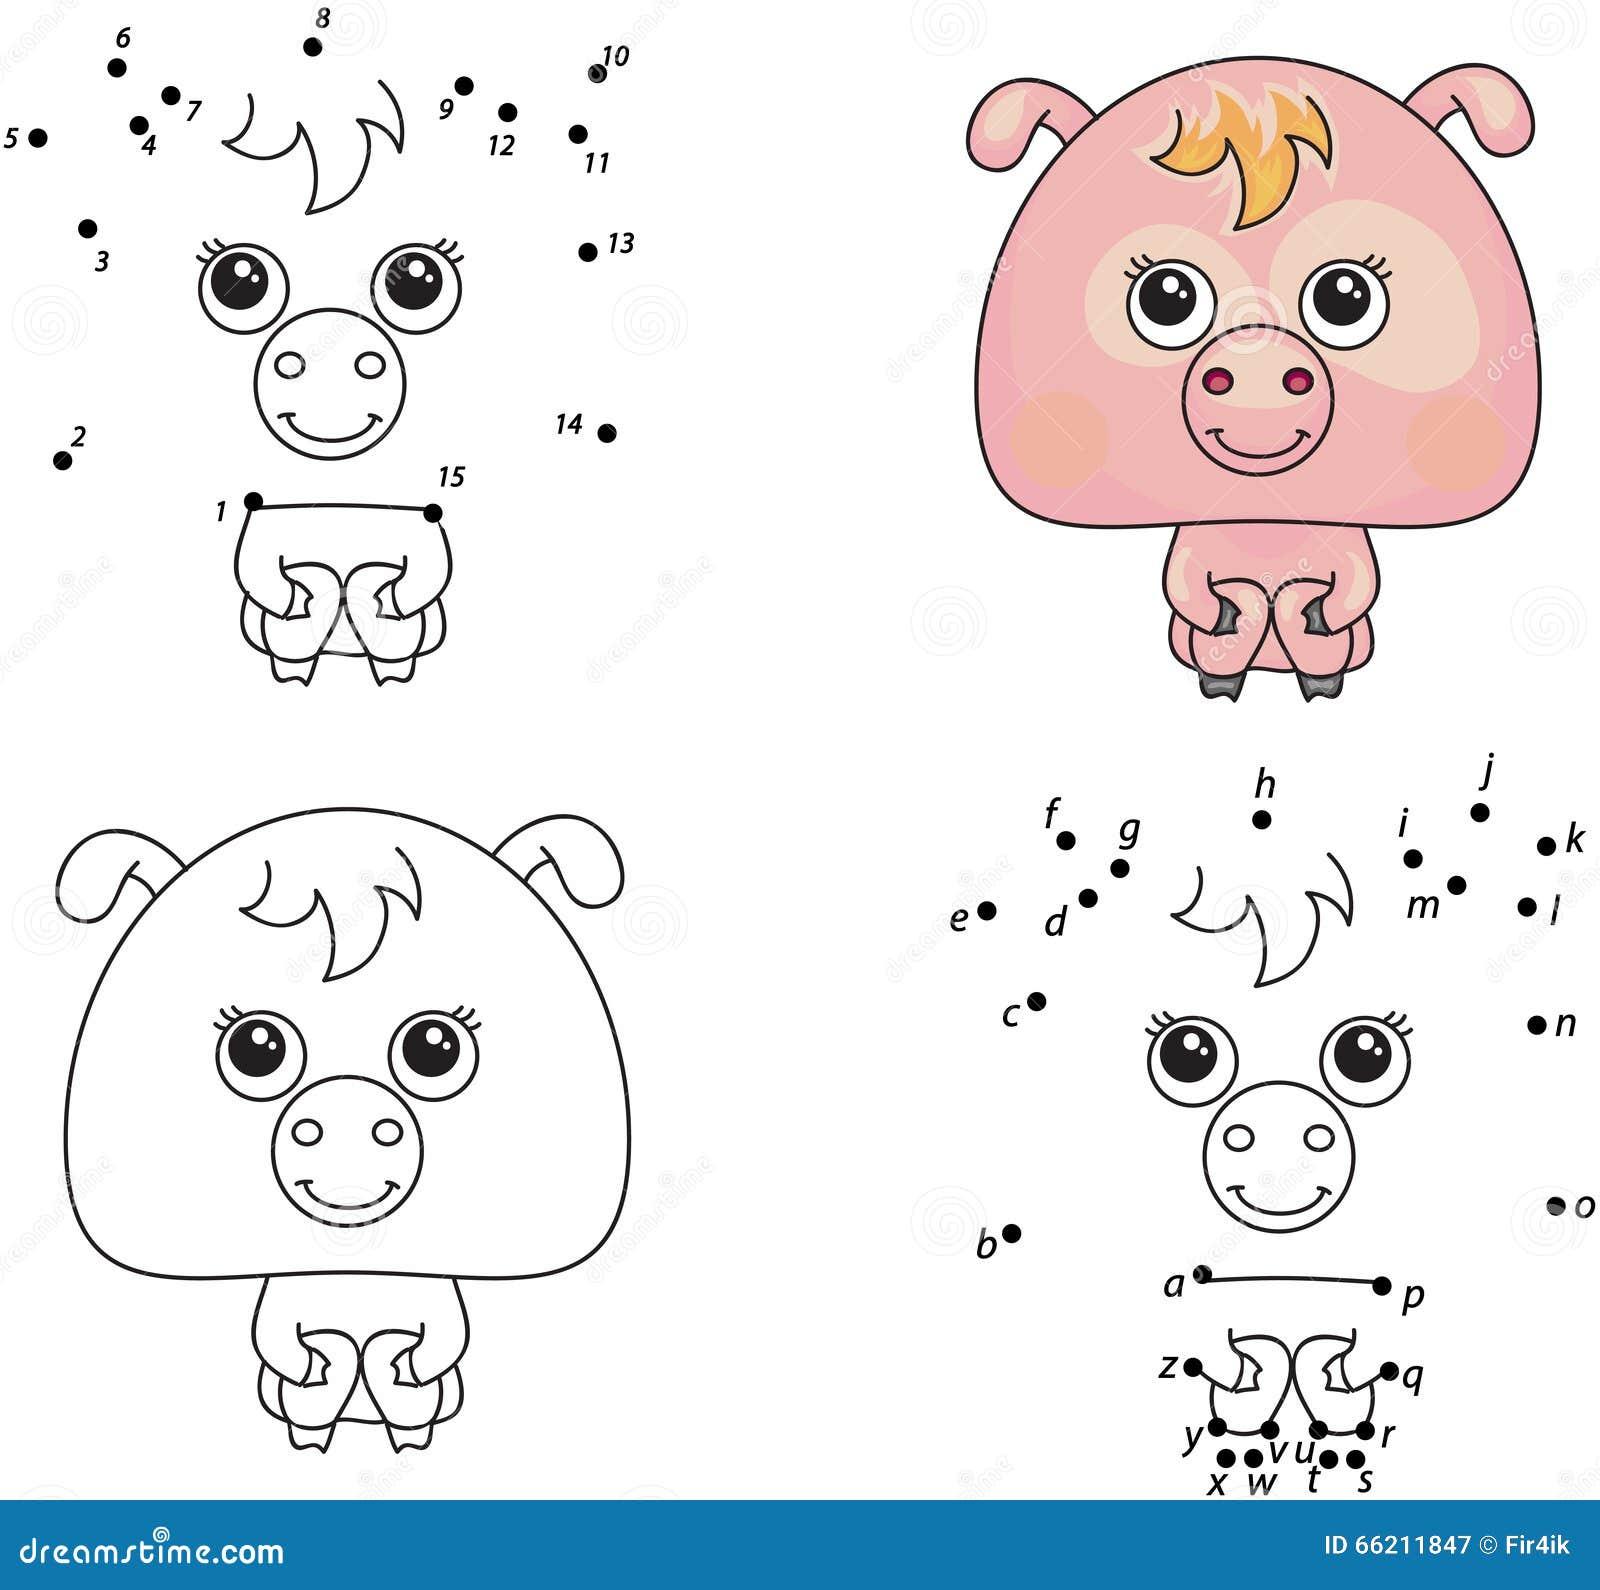 Moderno Cerdos Colorantes Inspiración - Enmarcado Para Colorear ...